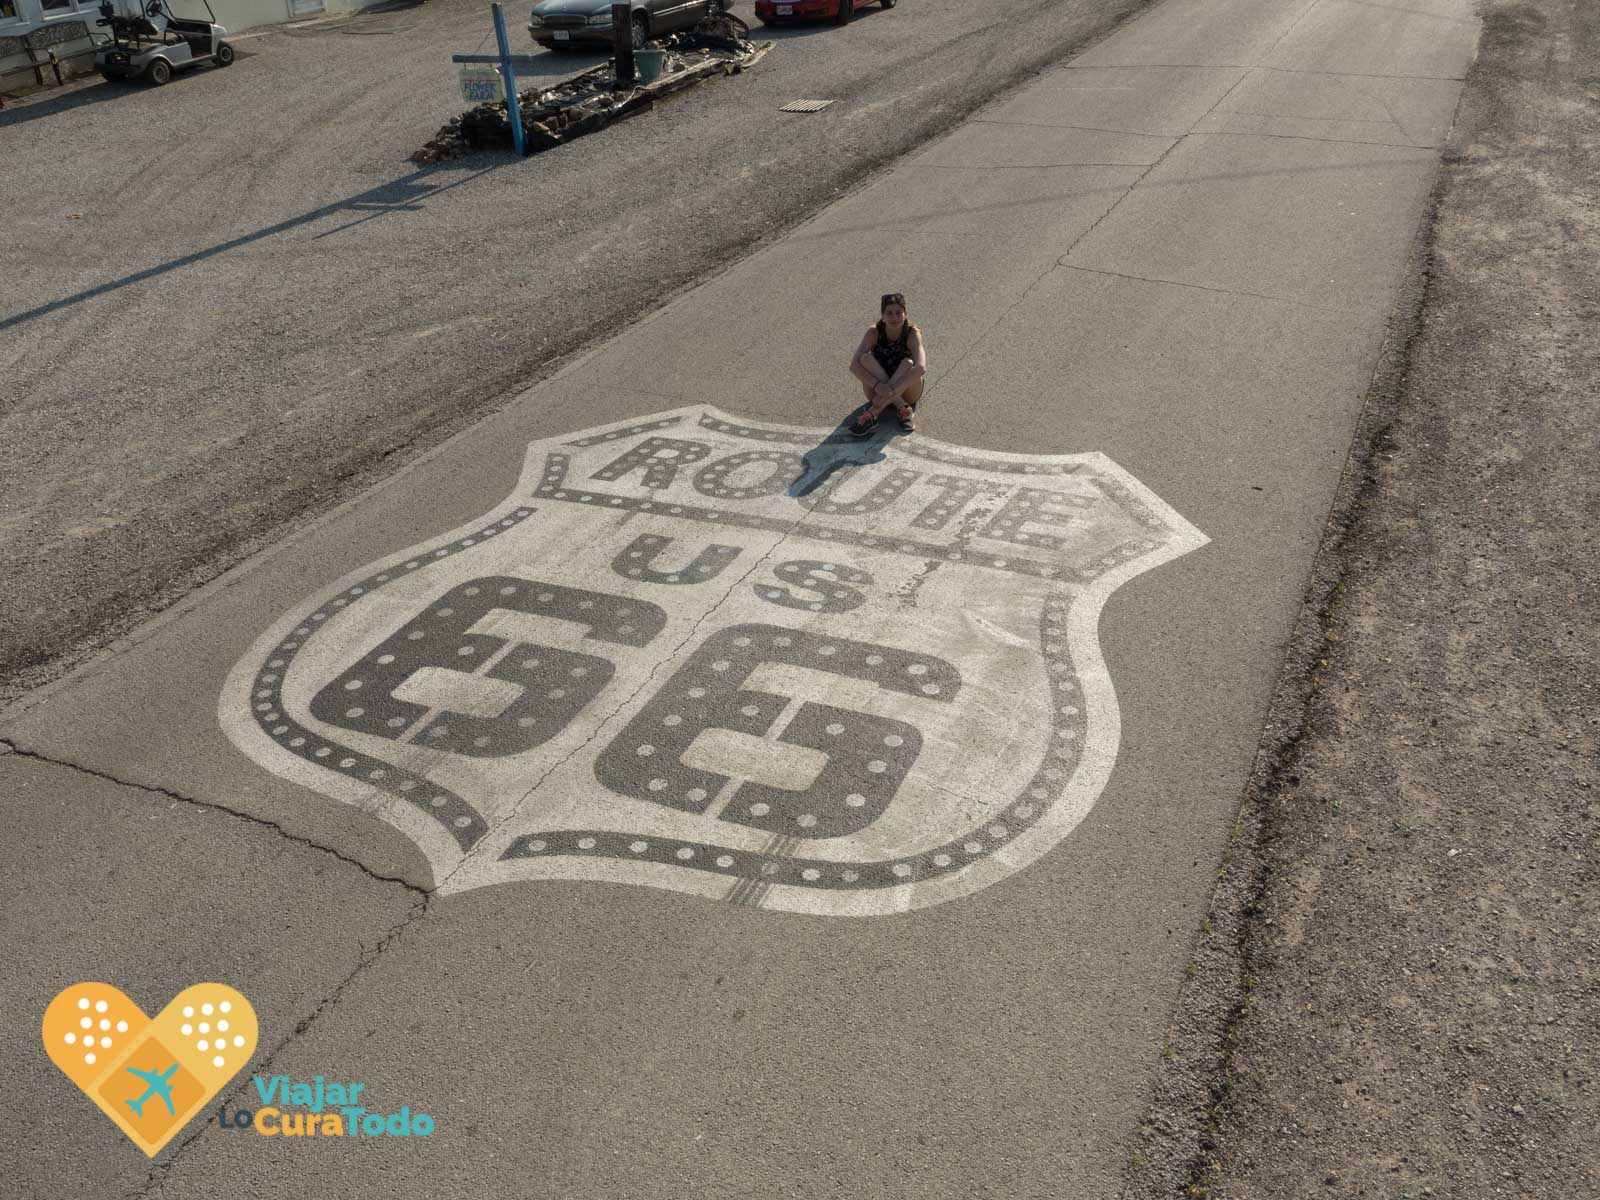 escudo ruta 66